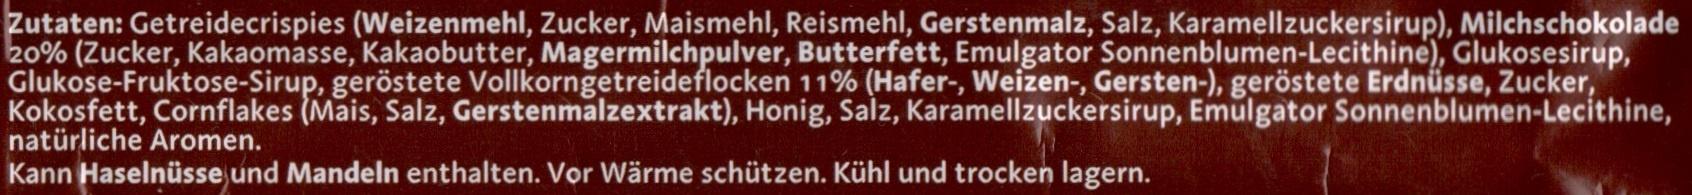 Corny BIG Schoko - Ingrédients